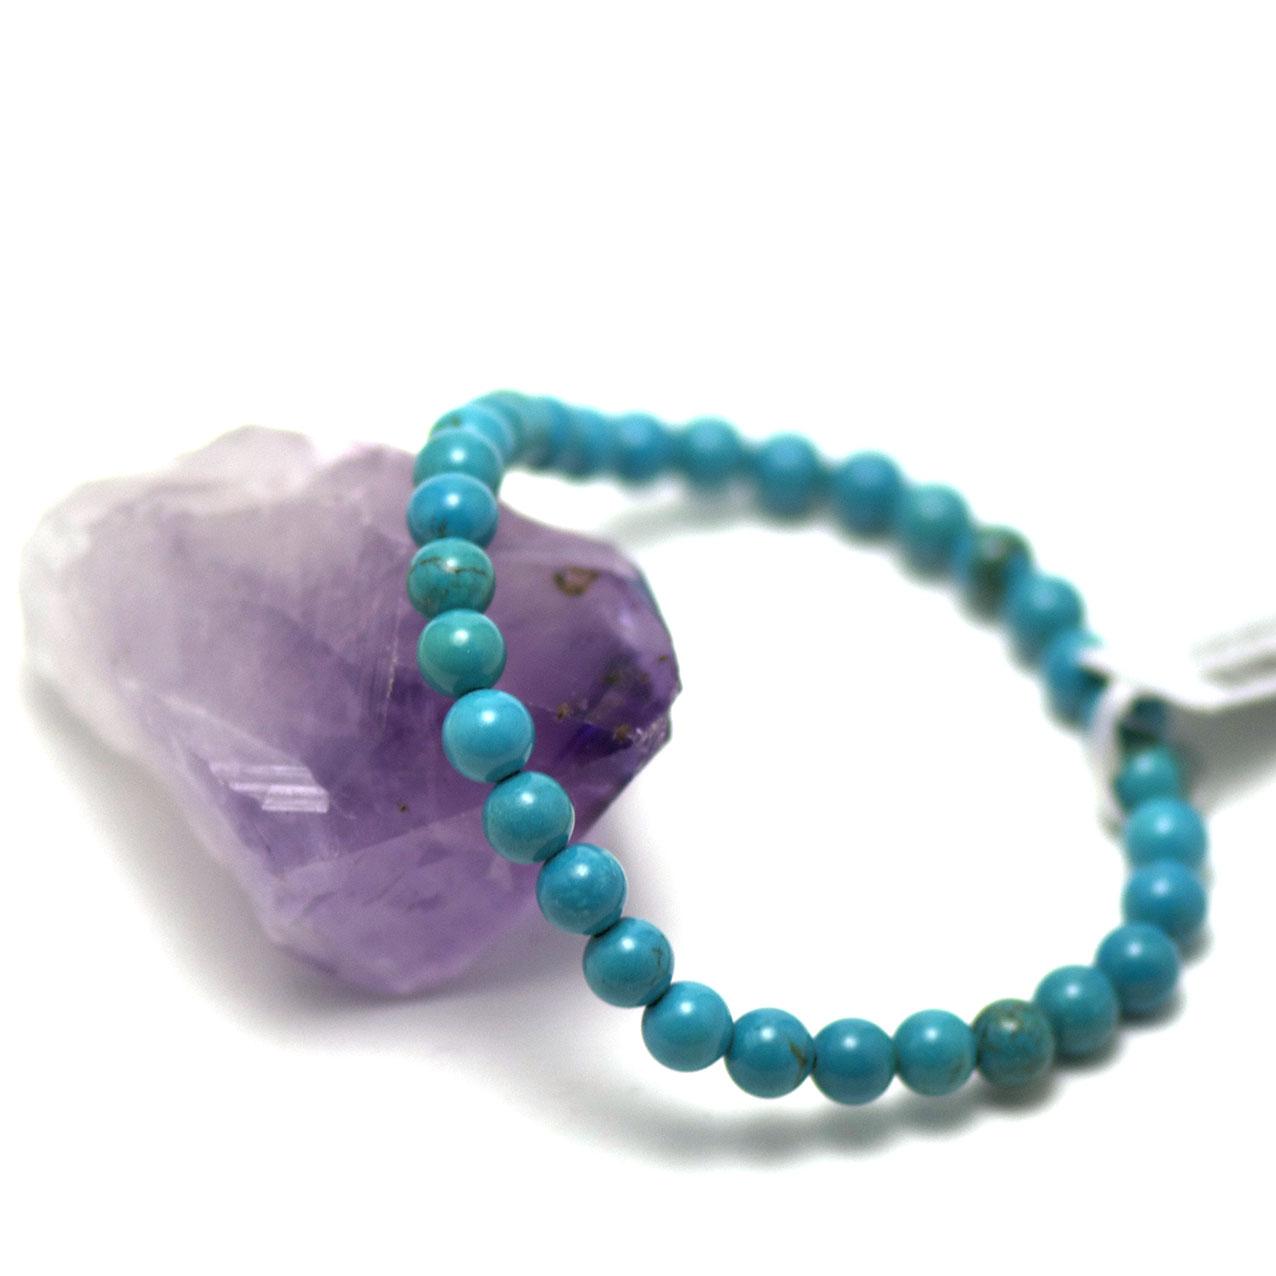 Bracelet turquoise perle ronde 6 mm